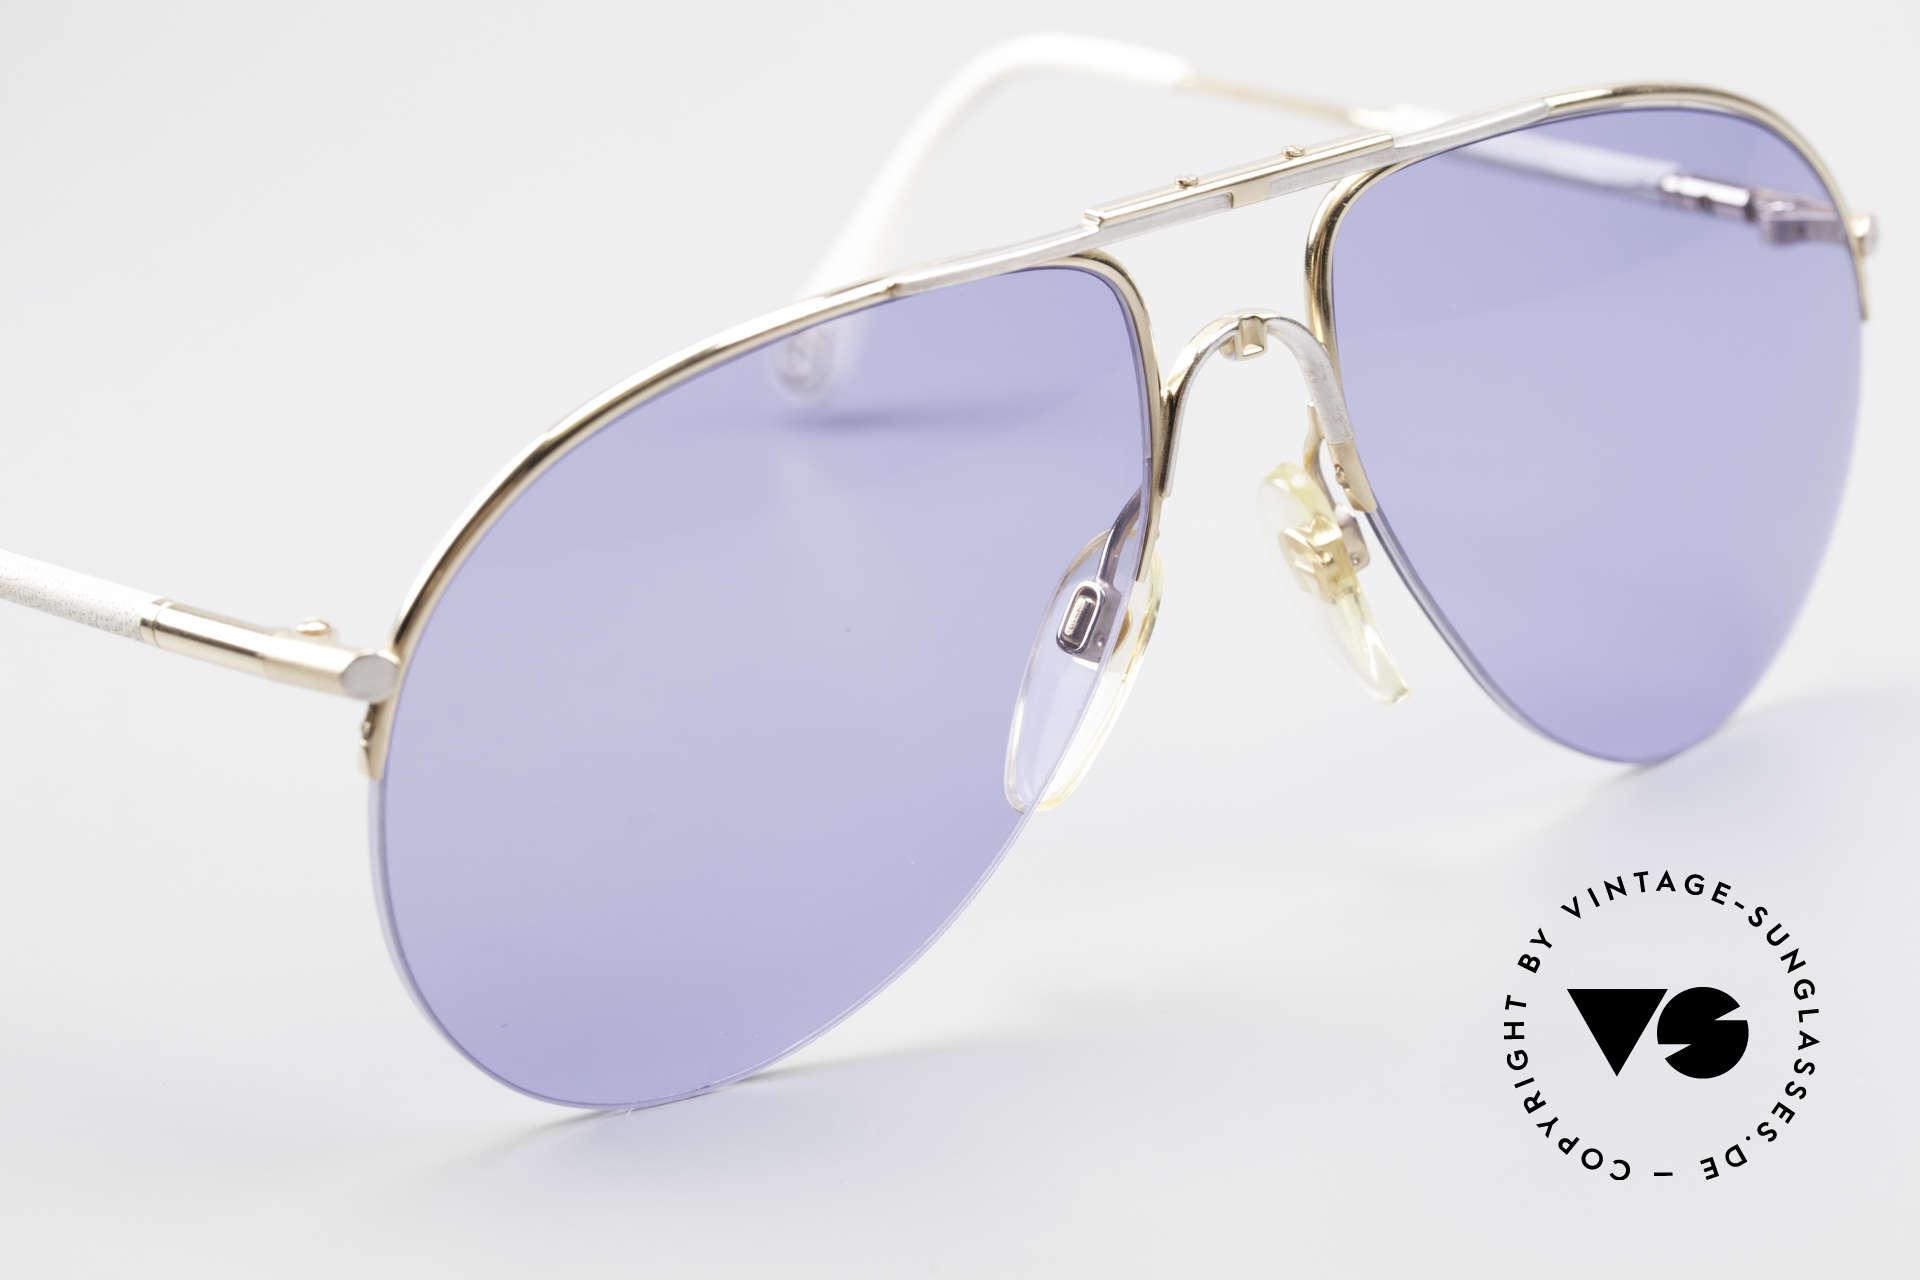 Aigner EA2 Rare 80's Vintage Sunglasses, unworn (like all our rare 80's Aigner sunglasses) + pouch, Made for Men and Women